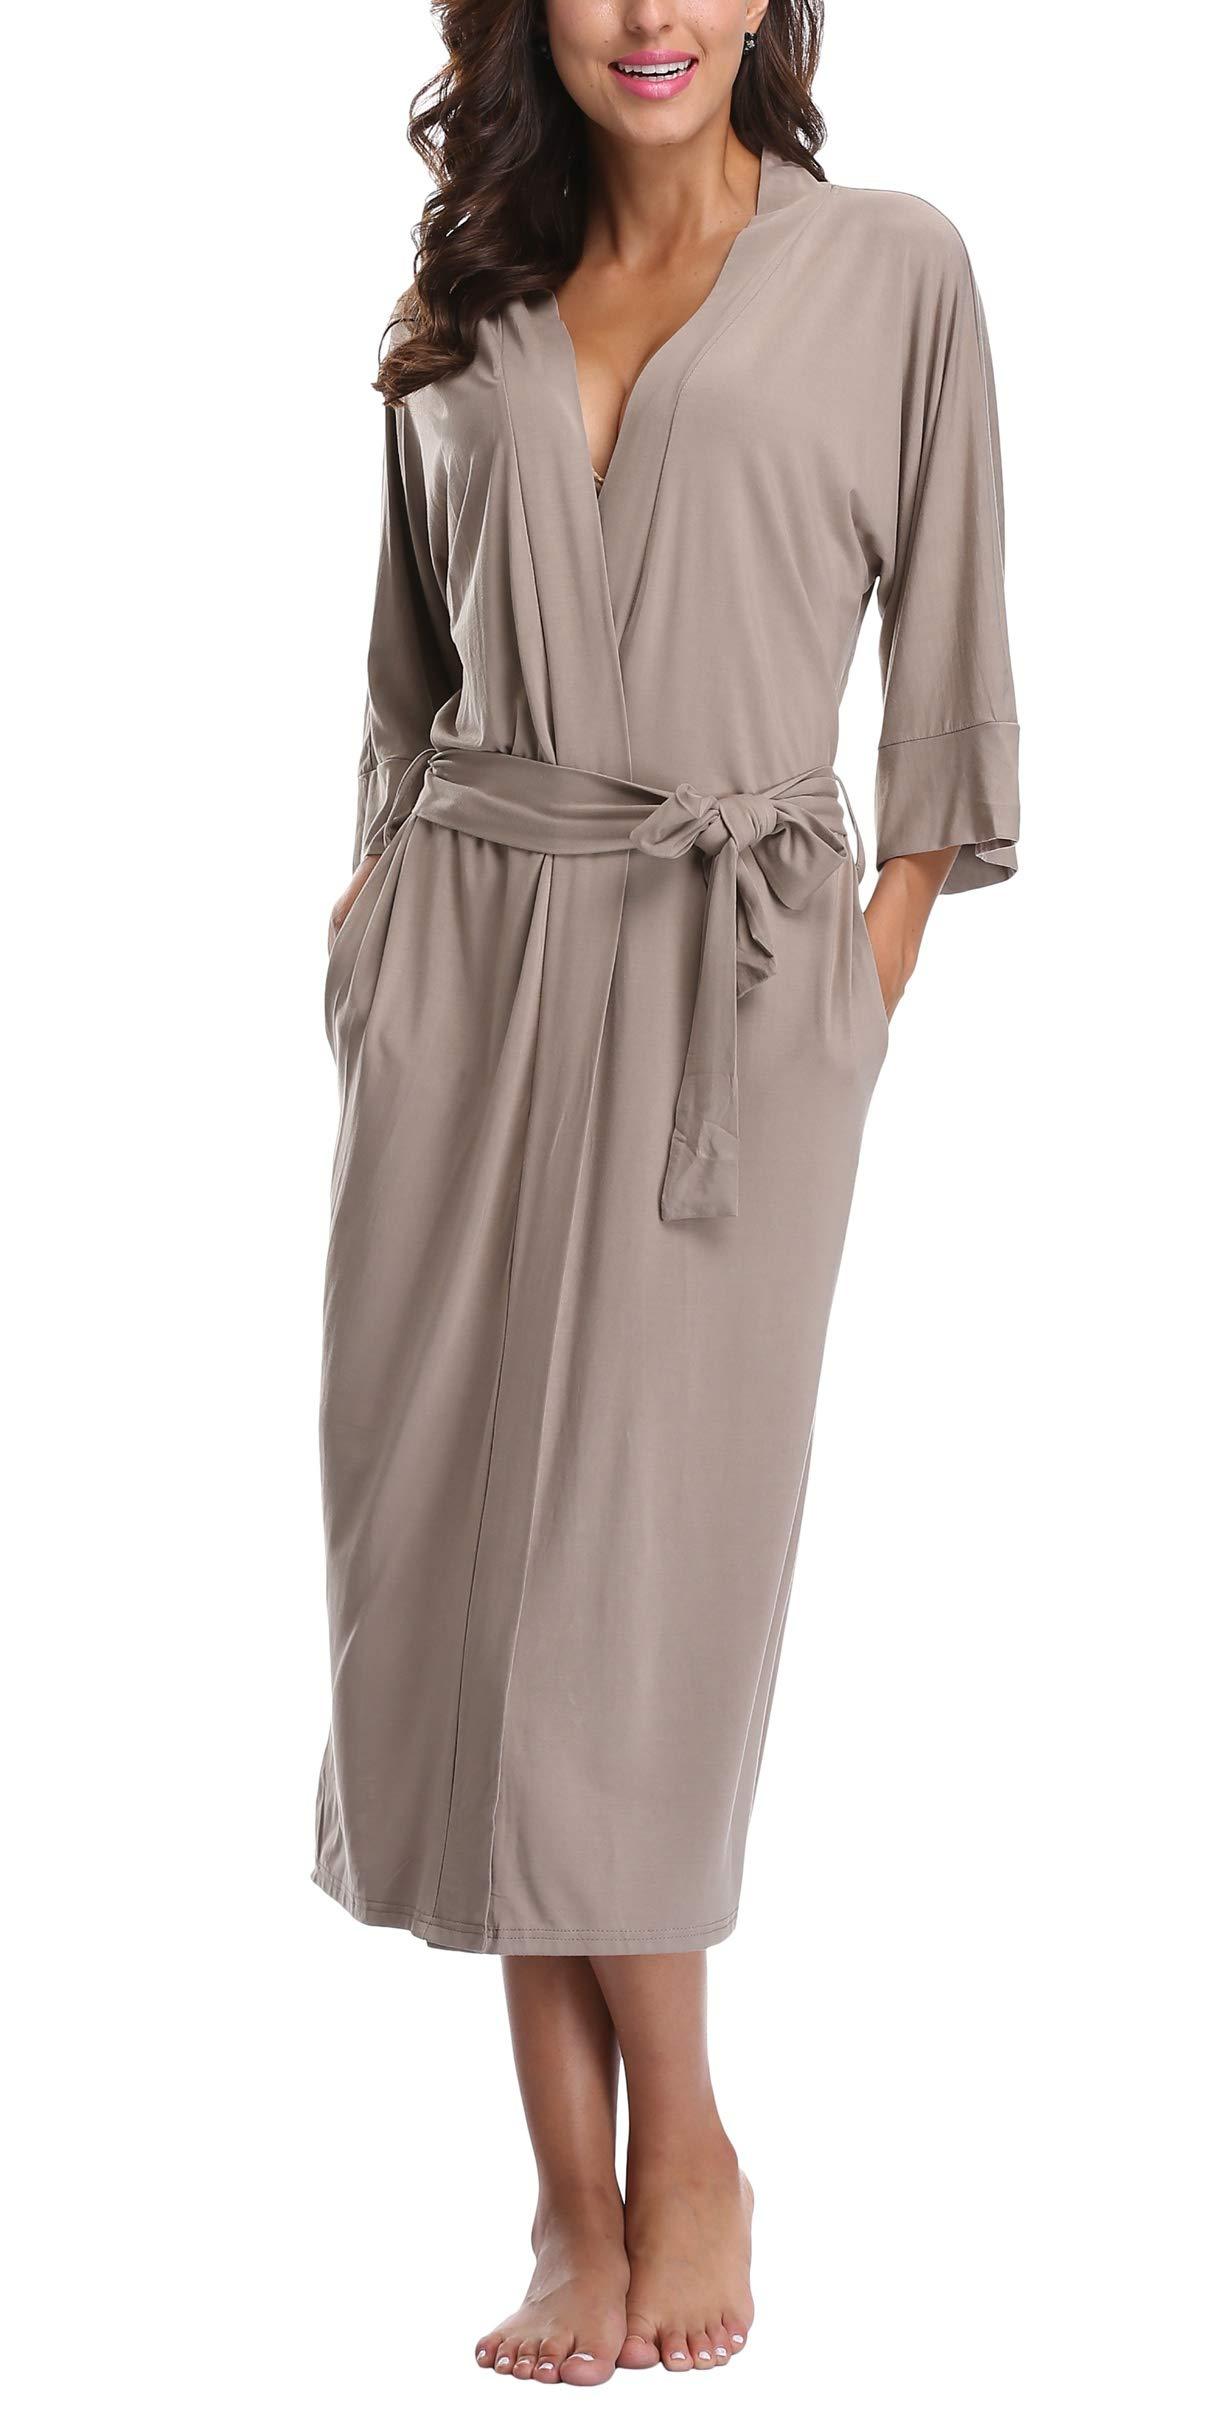 WitBuy Women's Long Cotton Robes for Women Modal Knit Bathrobes Full Length Dressing Gown